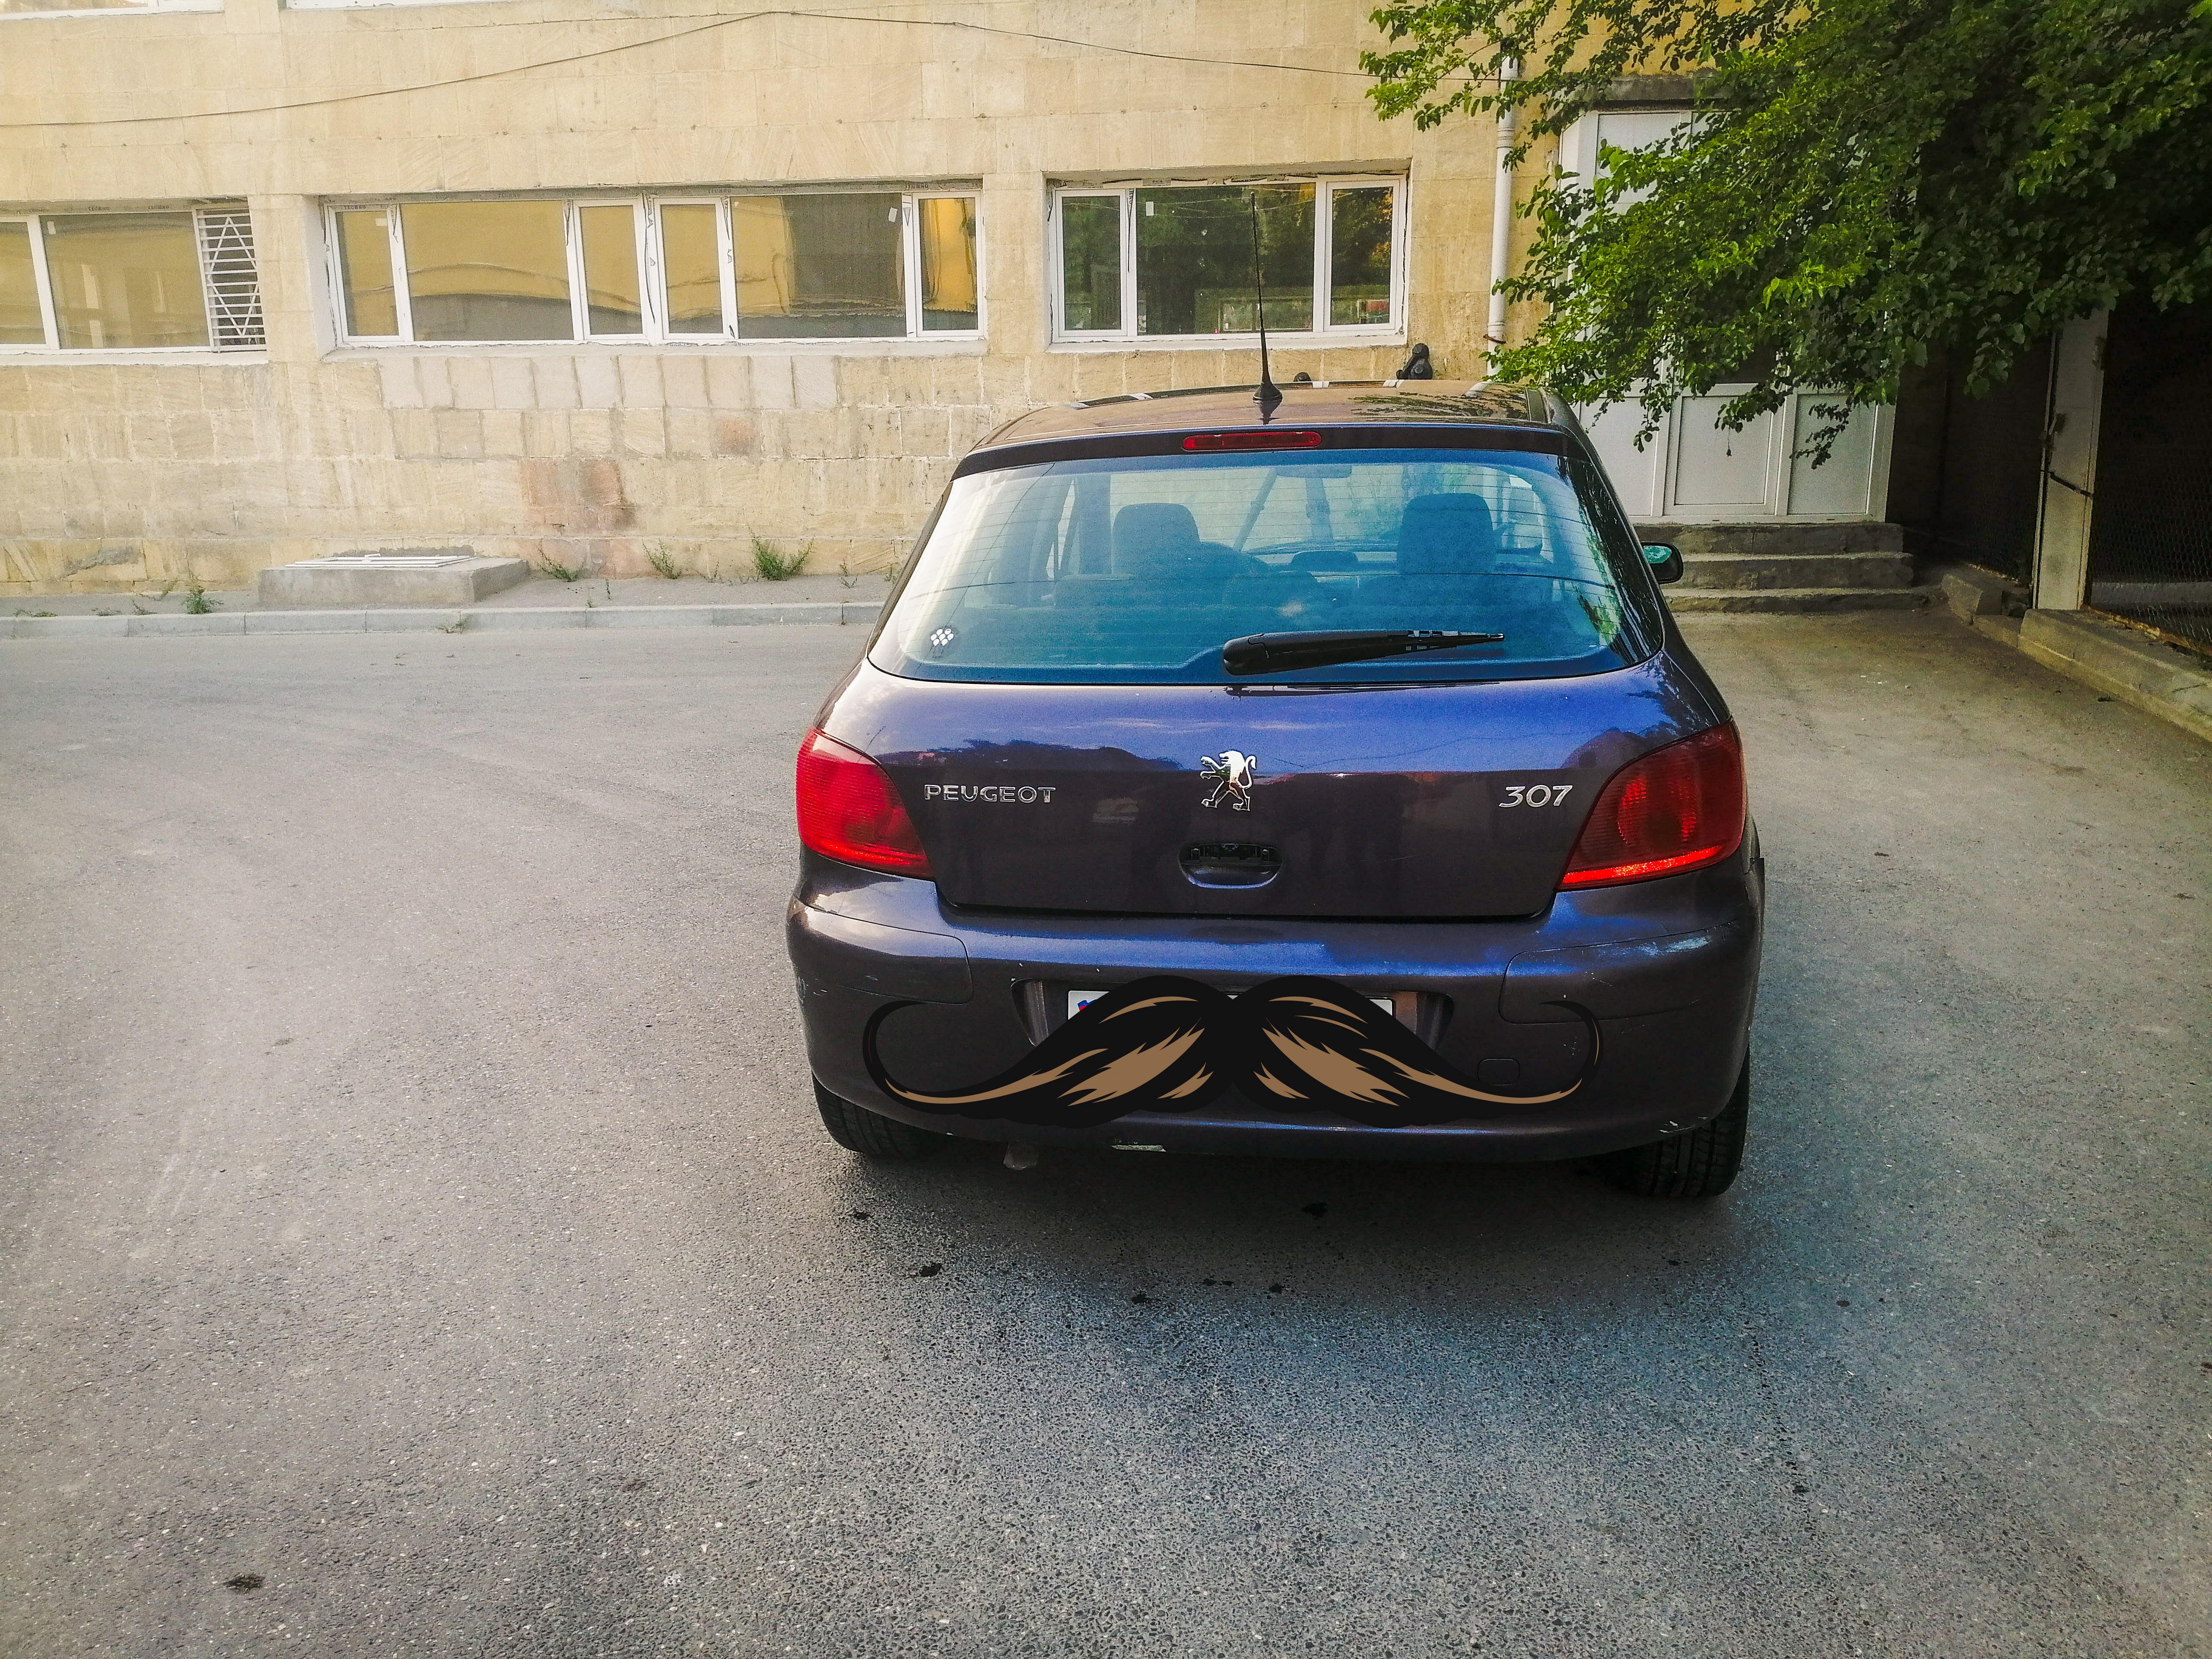 Peugeot 307 2.0(lt) 2002 İkinci əl  $2800